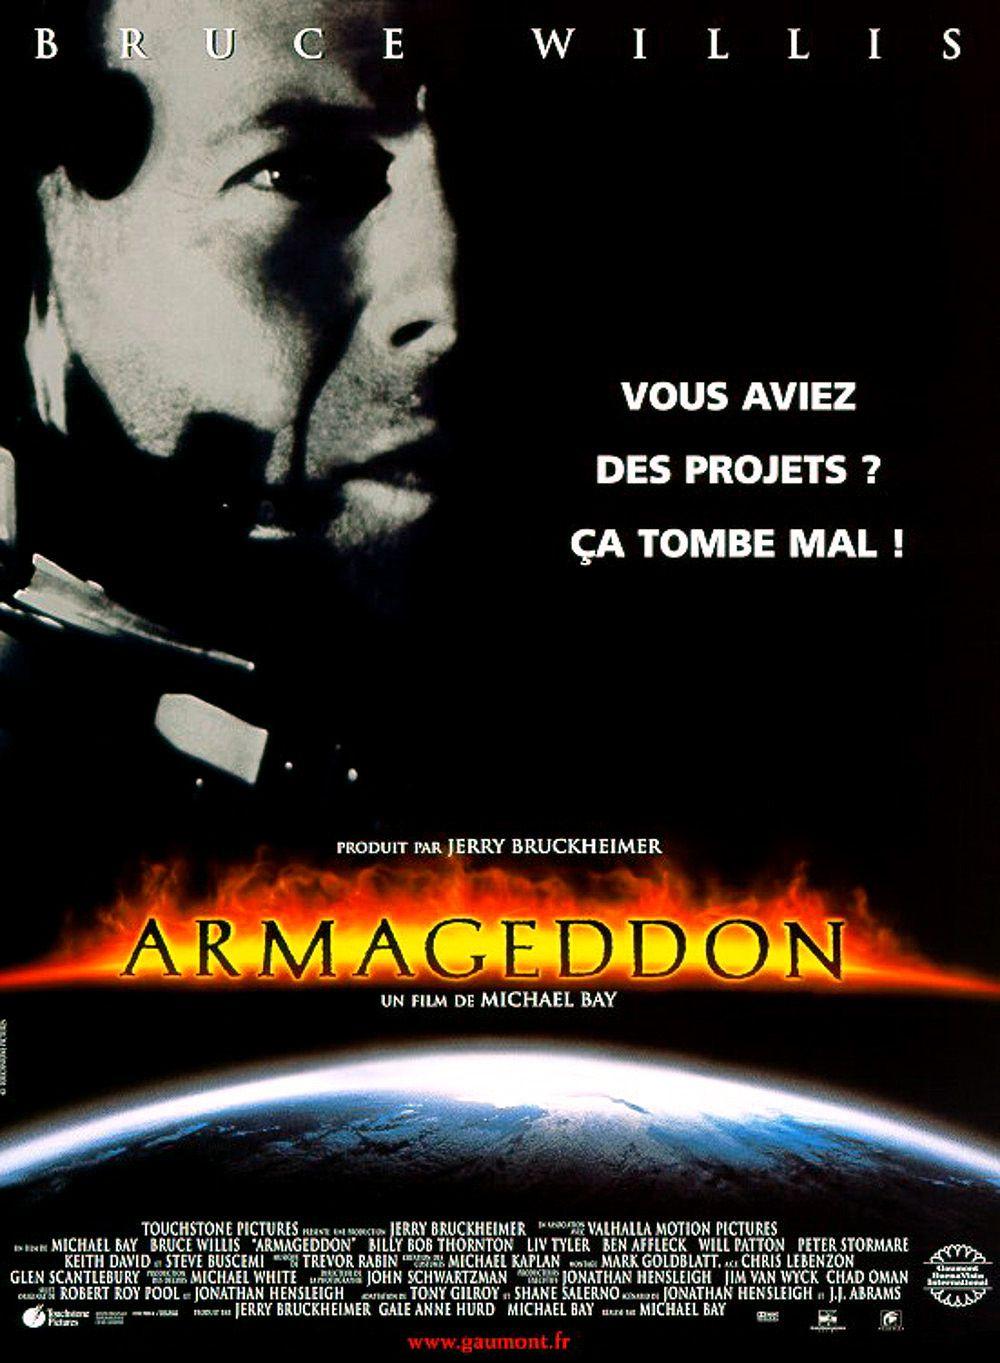 armageddon movie poster - HD924×1292